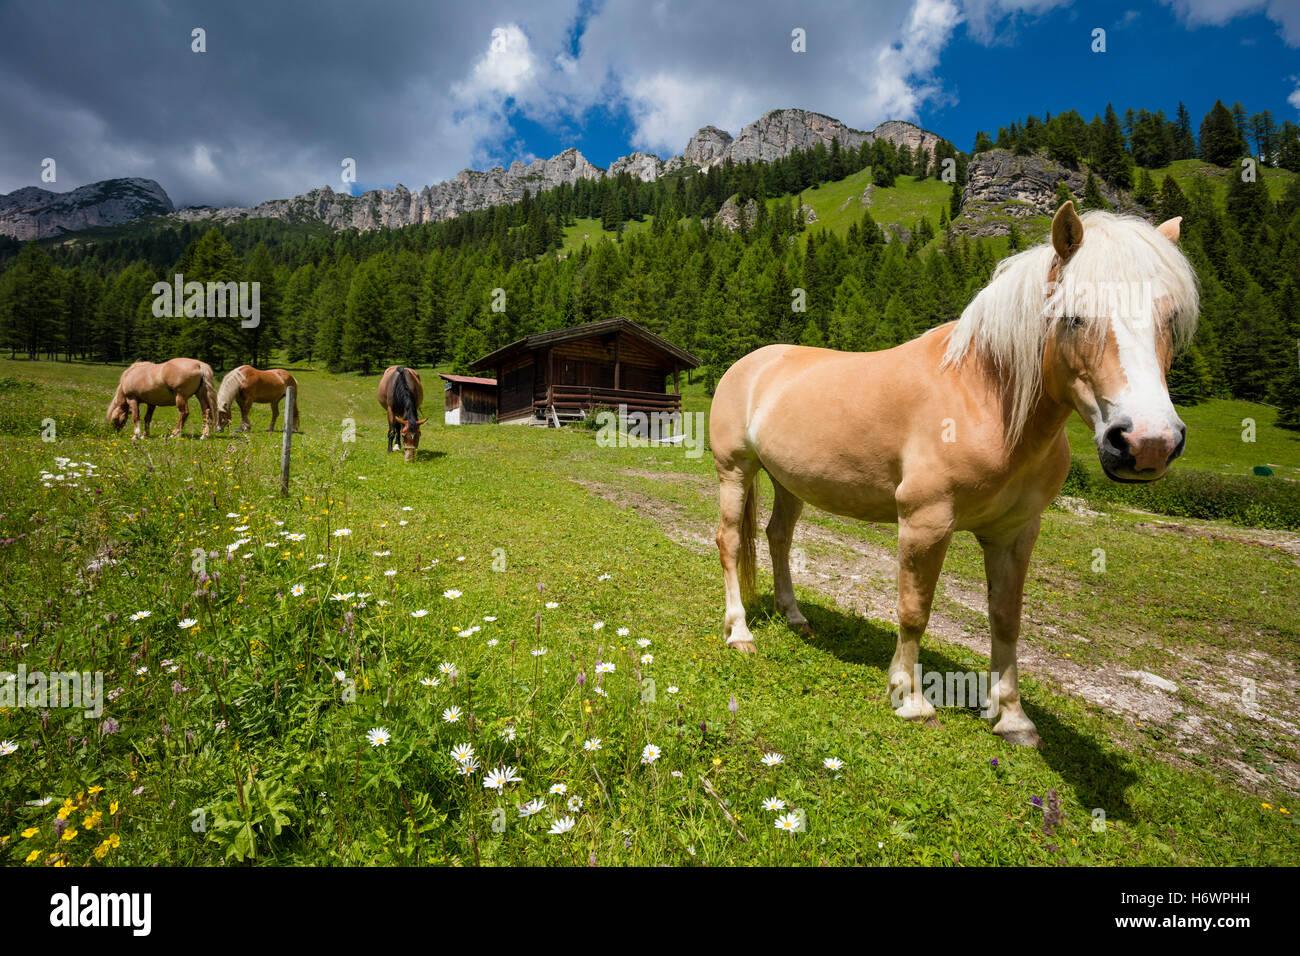 Haflinger horses in an alpine pasture near Misurina, Sexten Dolomites, South Tyrol, Italy. - Stock Image